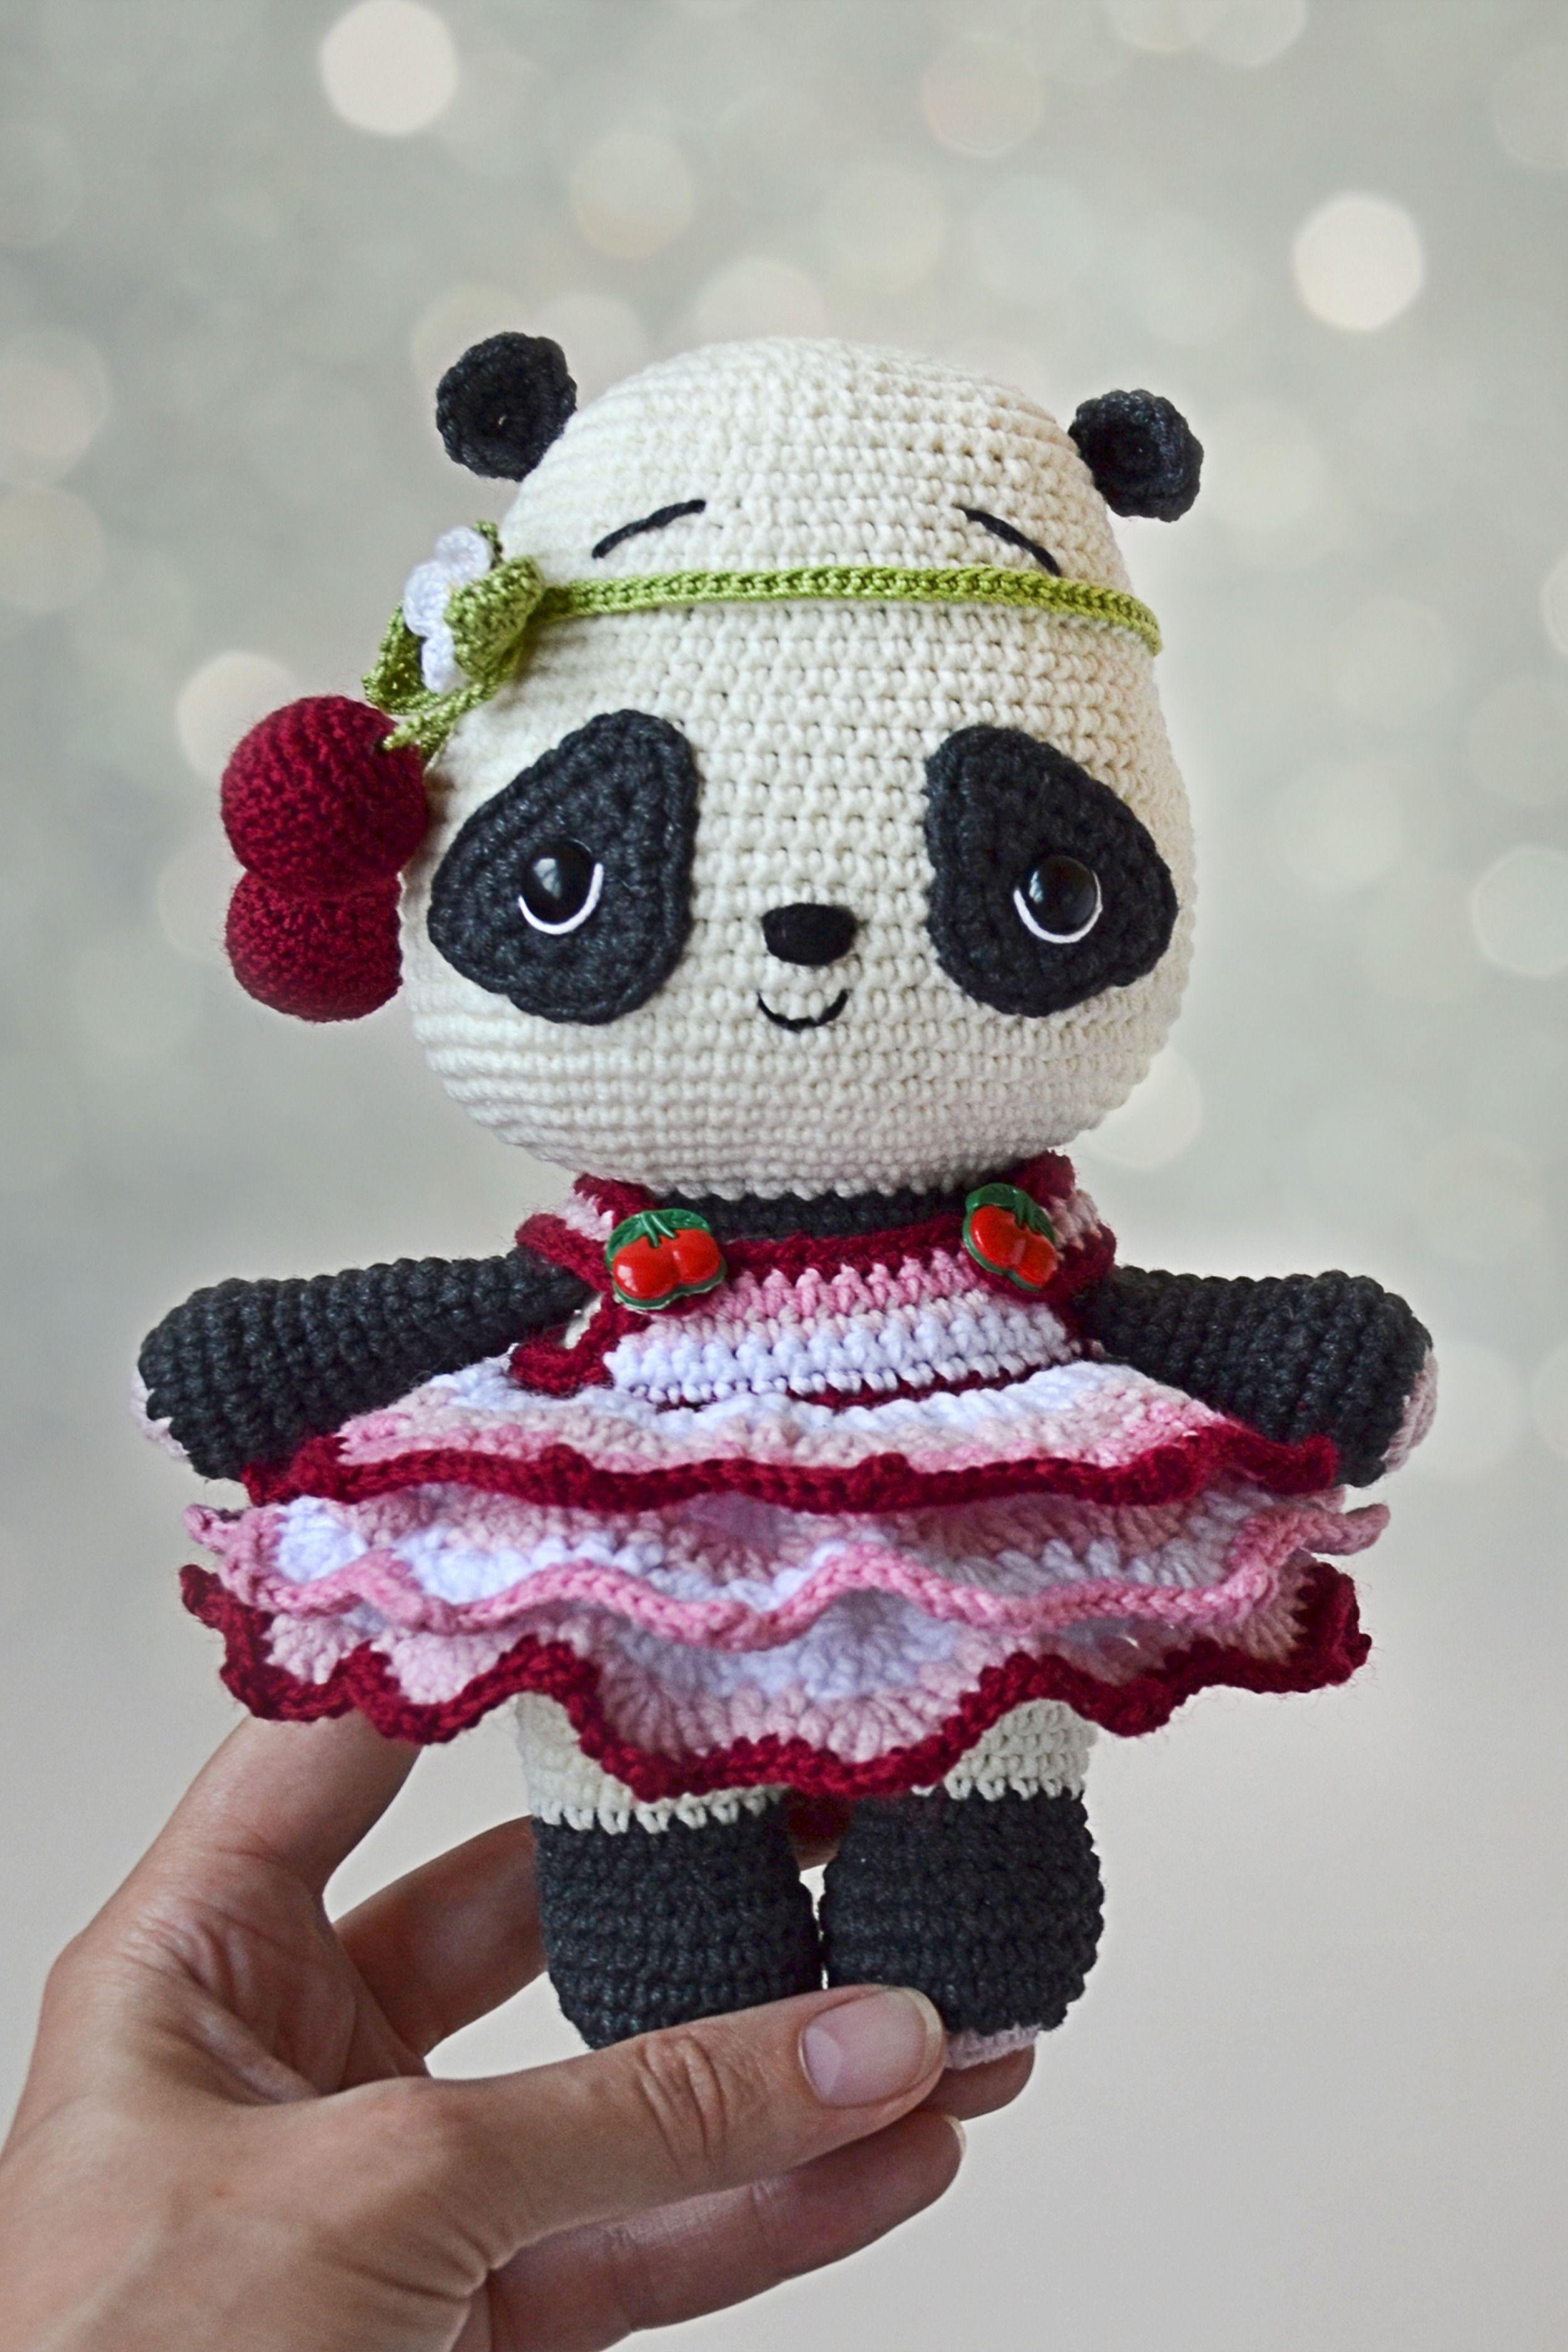 Como Fazer Panda Amigurumi de Croche - Receitas Passo a Passo Para  Iniciantes - YouTube | 3749x2500